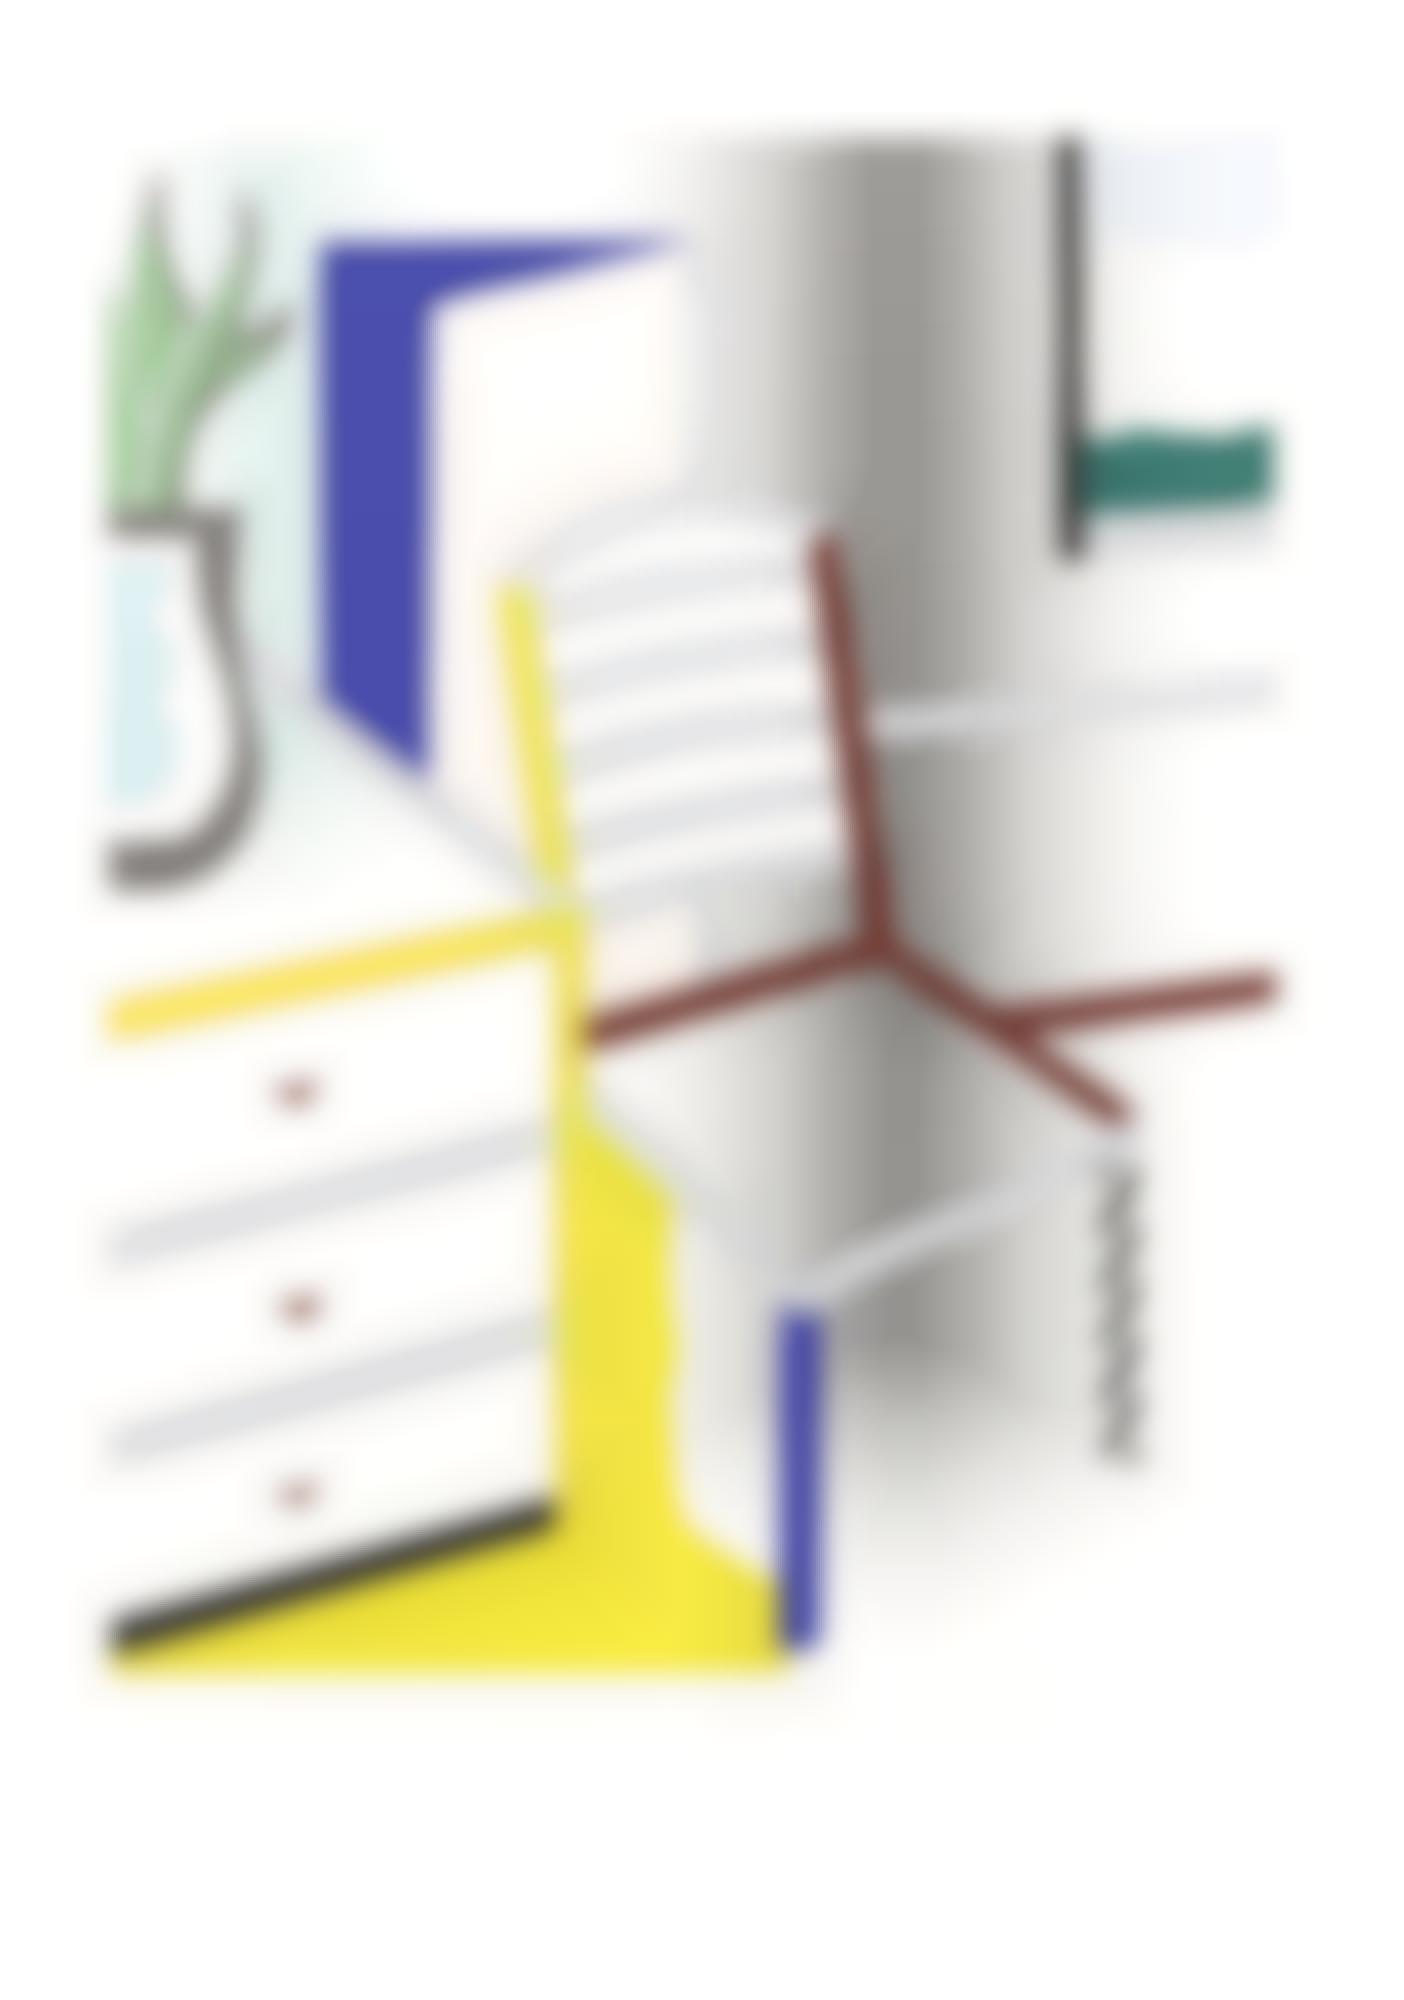 Portfolio - Leo Castelli'S 90Th Birthday (Jasper Johns, Leo; Ellsworth Kelly, Blue (for Leo); Joseph Kosuth, Titled Quoatation (for L.C.); Roy Lichtenstein, Interior with Chair; Bruce Nauman, Life Fly Life Flies; Robert Rauschenberg, Caucus; James Rosenquist, Flame Still Dances on Leo's Book; Edward Ruscha, L.C.; Richard Serra, Leo)-1997